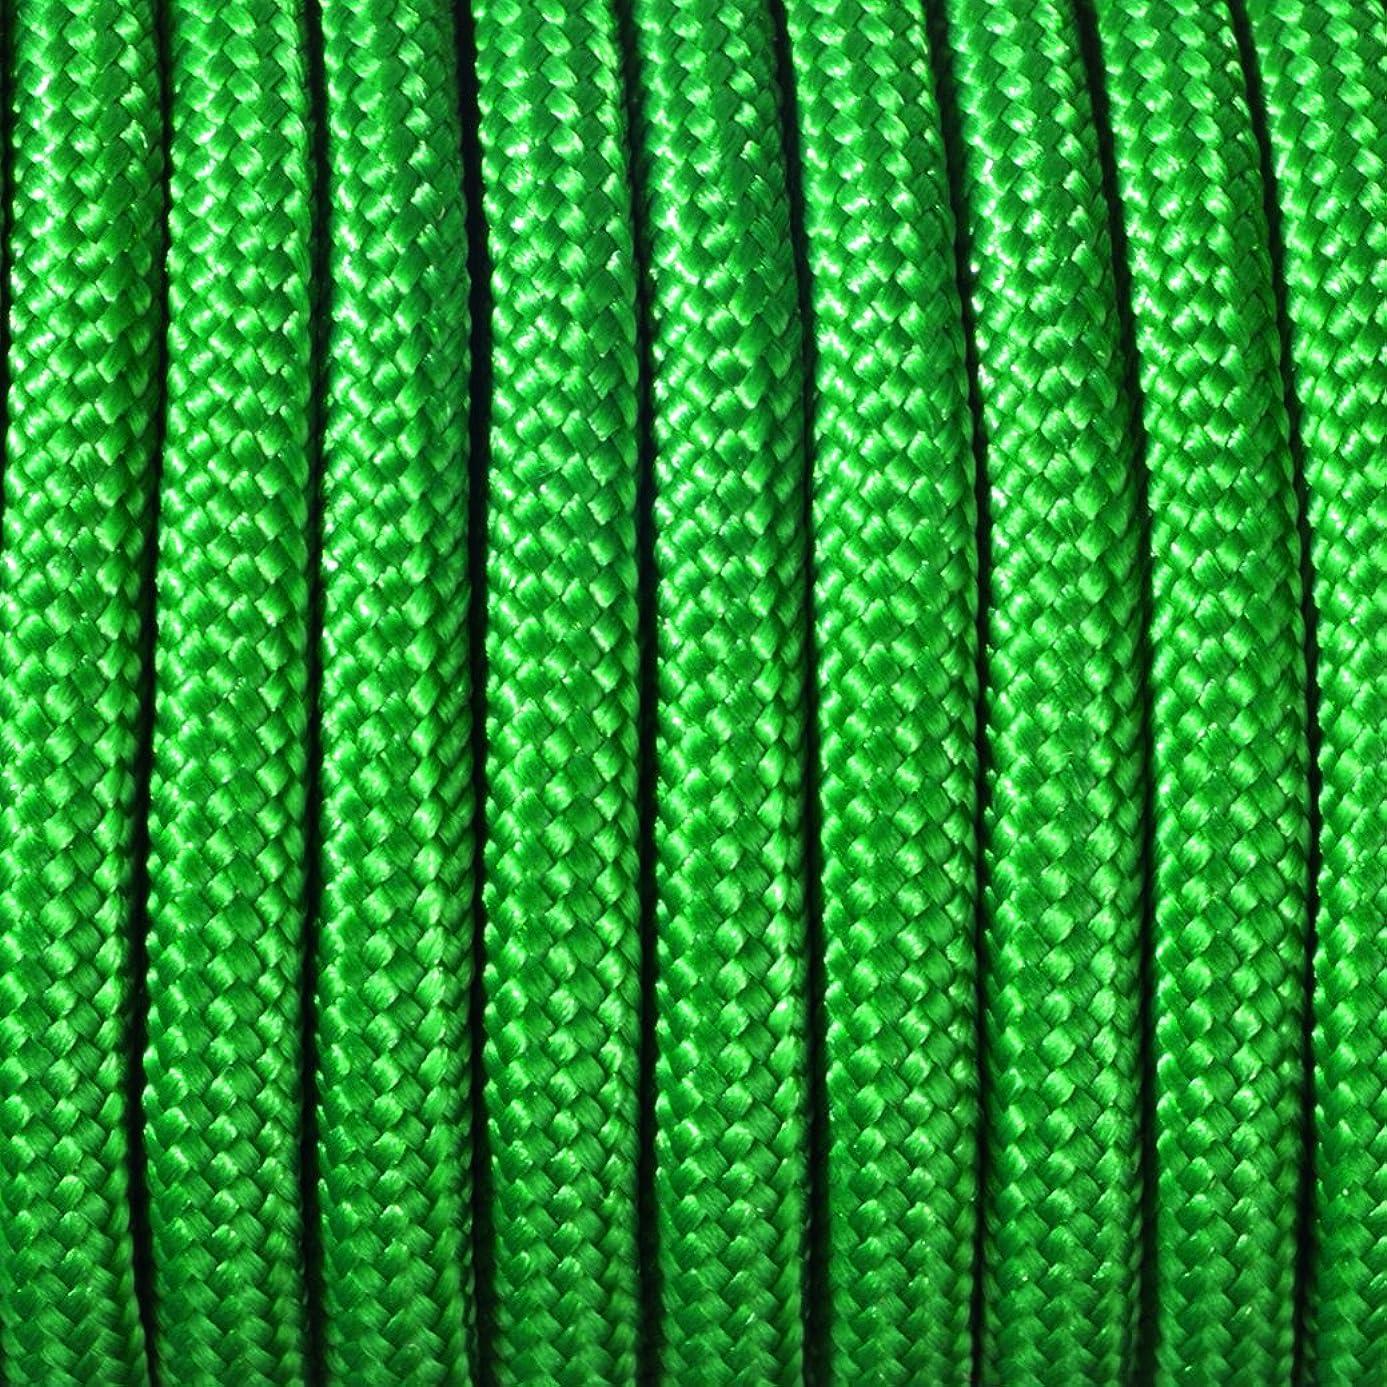 Efco Paracord 550 4 mm x 4 m 1 pc. Green, Polyurethane Cotton, 20 x 10 x 5 cm